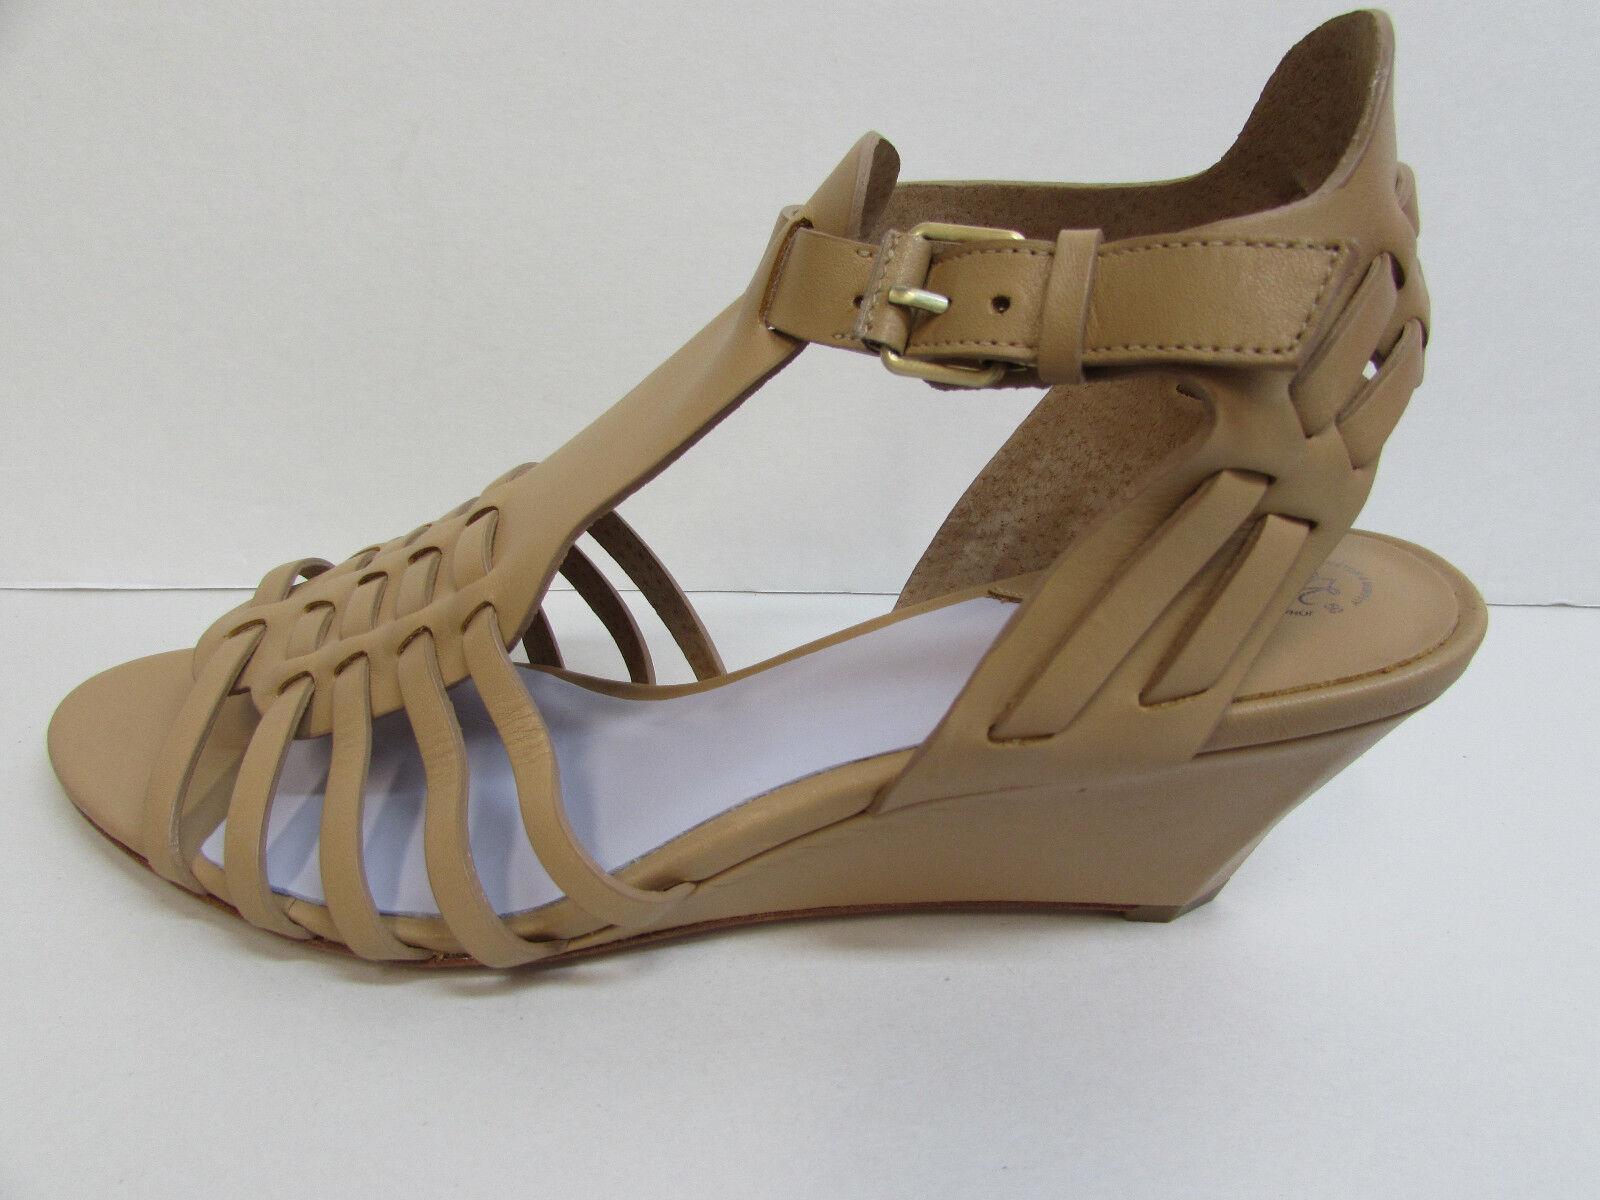 Johnston Murphy Größe 9.5 Tan Leather Wedge Heels New damen schuhe